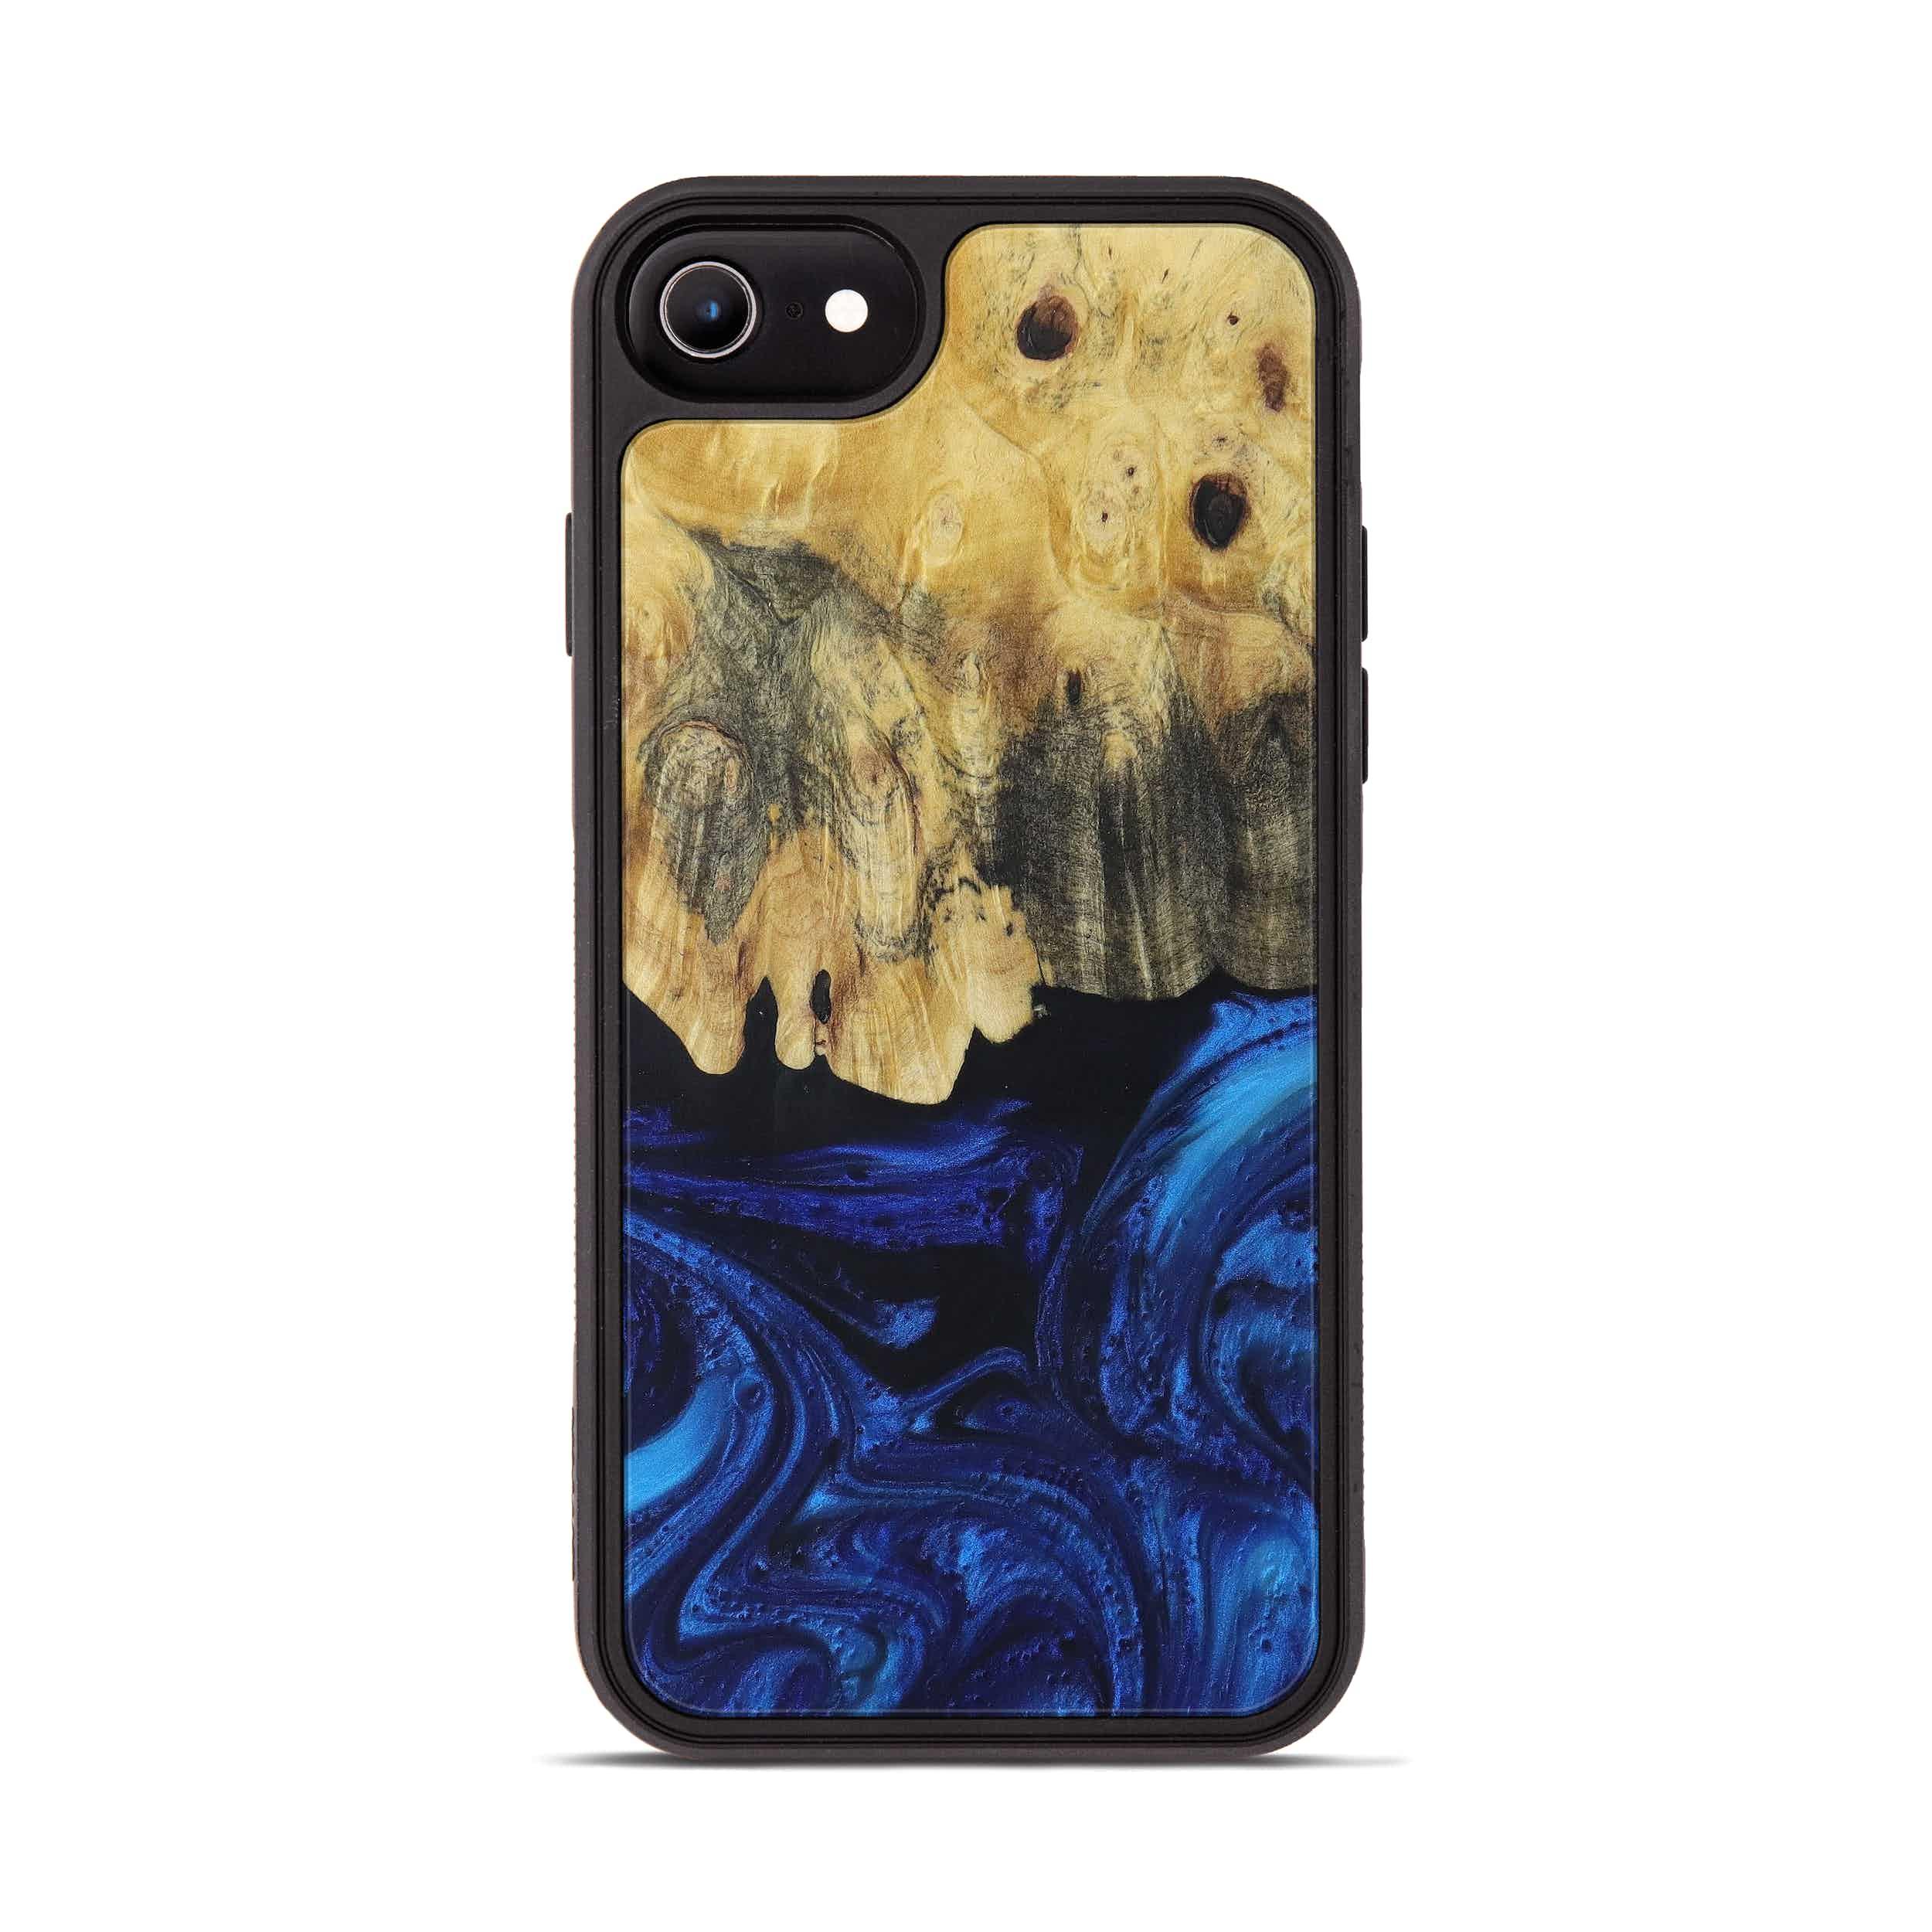 iPhone 7 Wood+Resin Phone Case - Colene (Dark Blue, 399851)